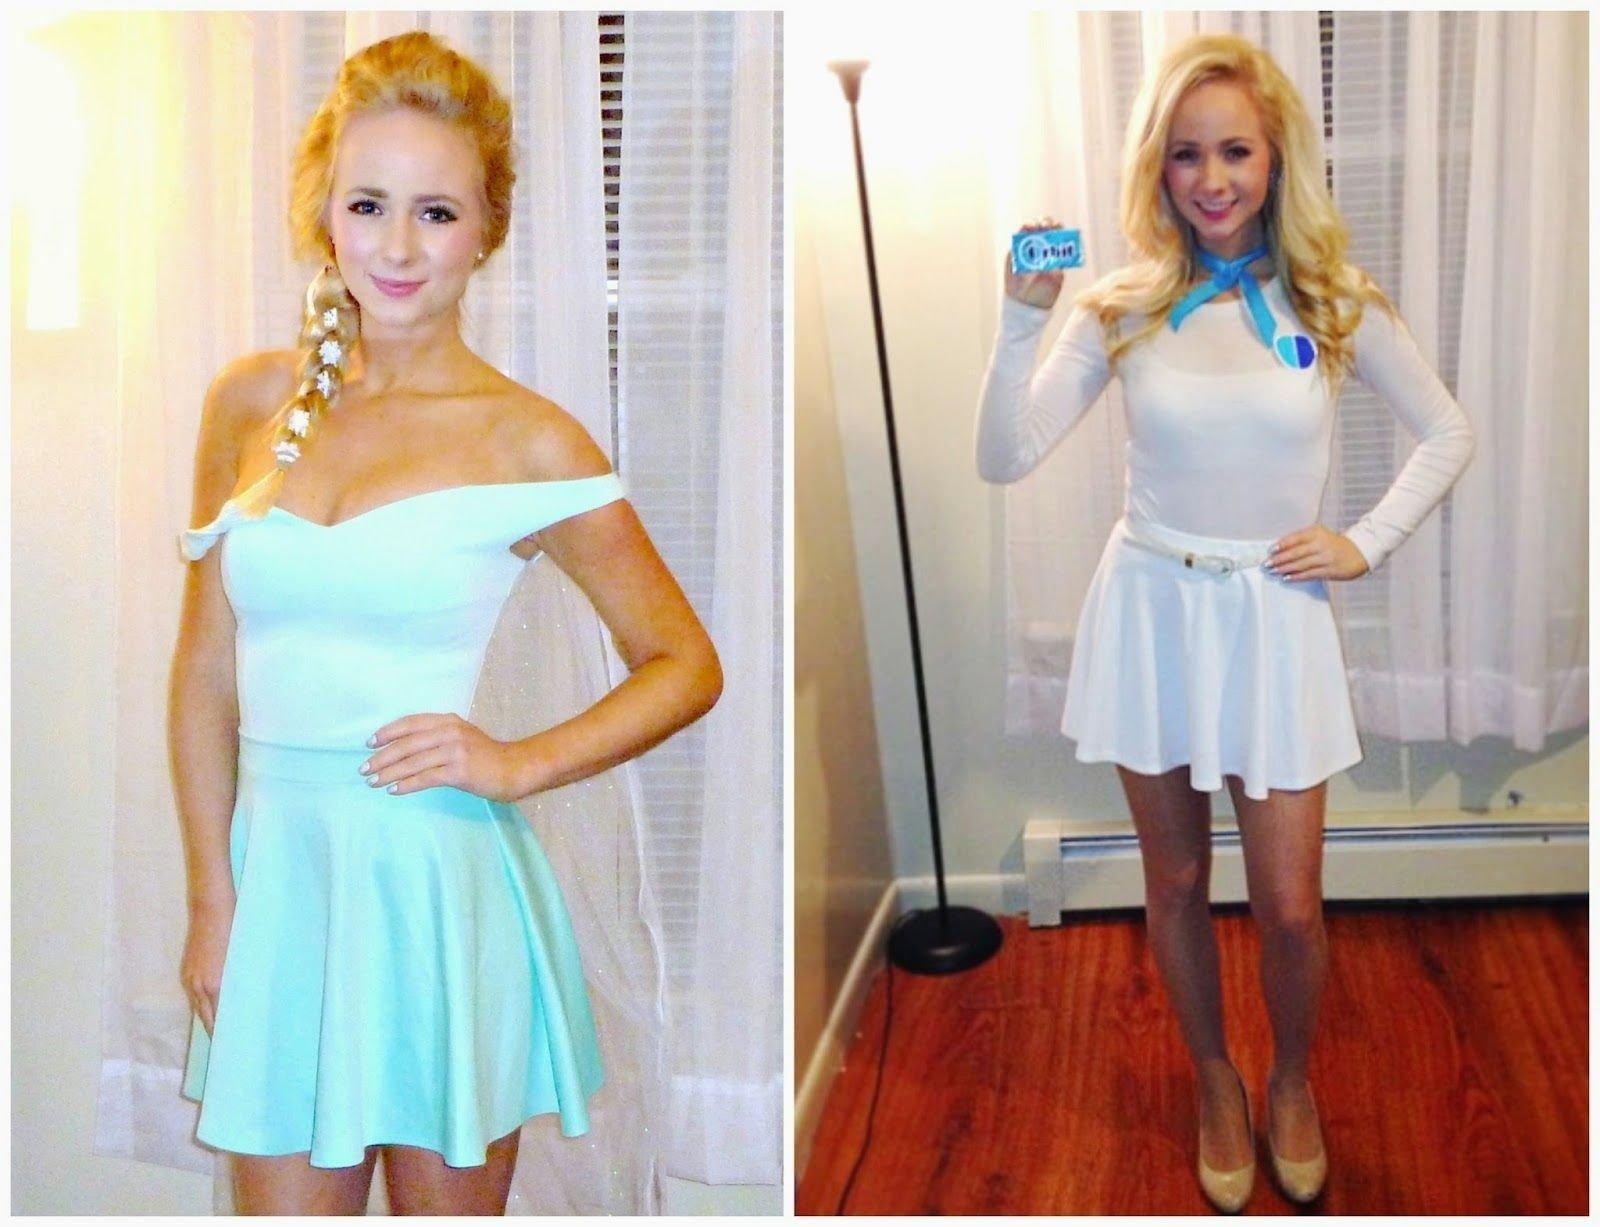 10 Great Halloween Costume Ideas For Blondes pinalexis schaufert on diy pinterest easy halloween costumes 2020